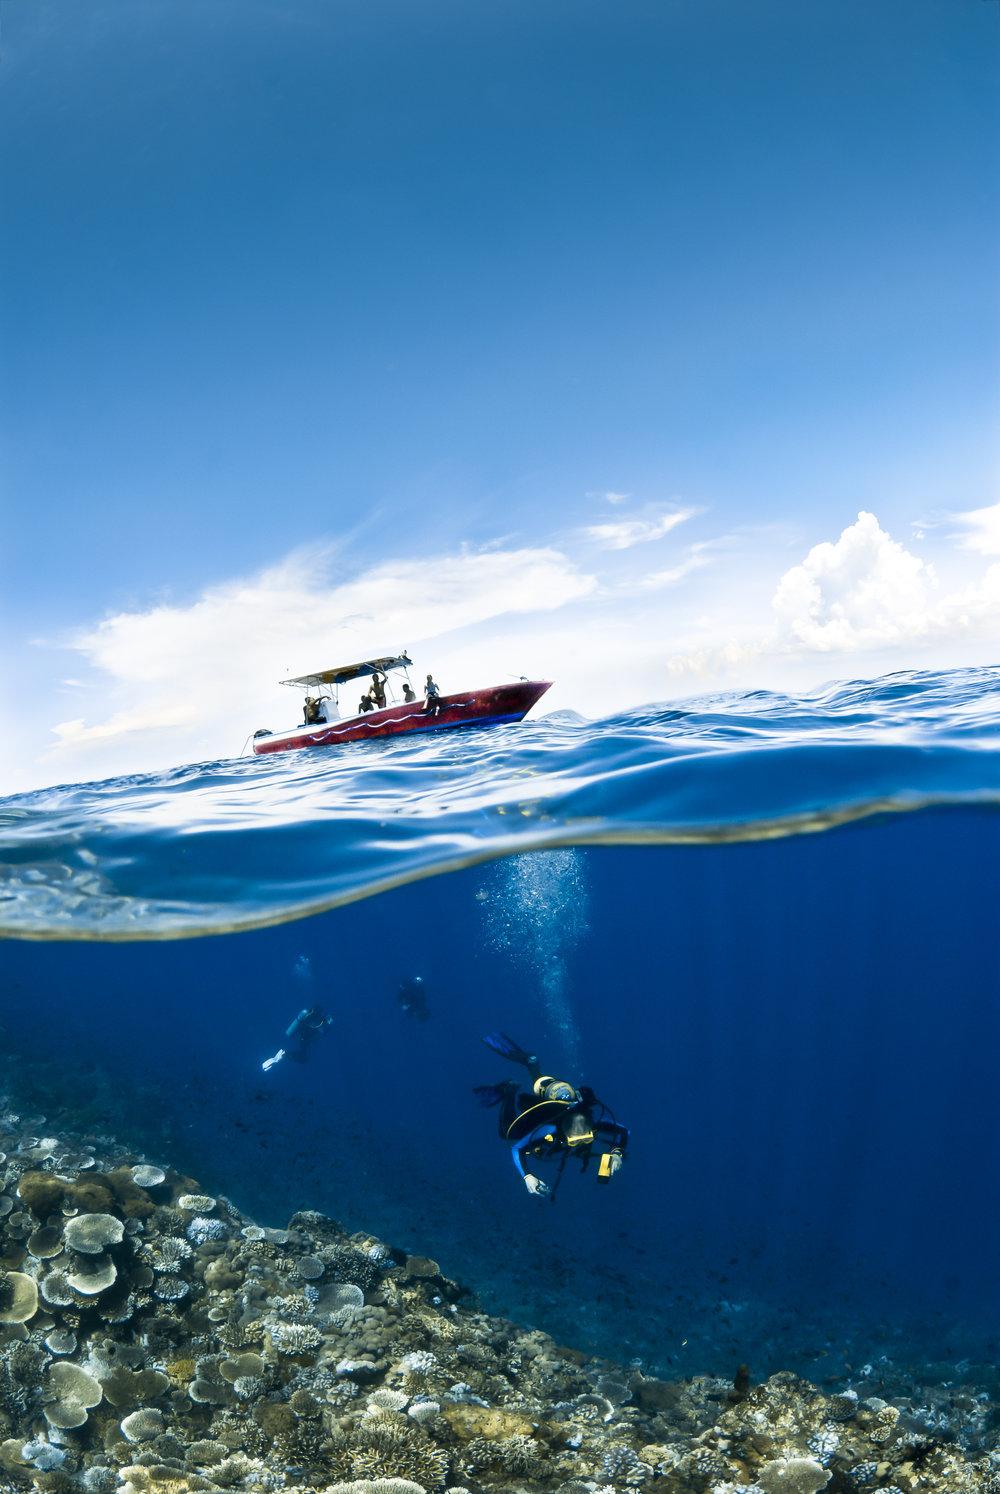 cVerde Island Split-Shot (various Acropora) credit: alex tyrrell